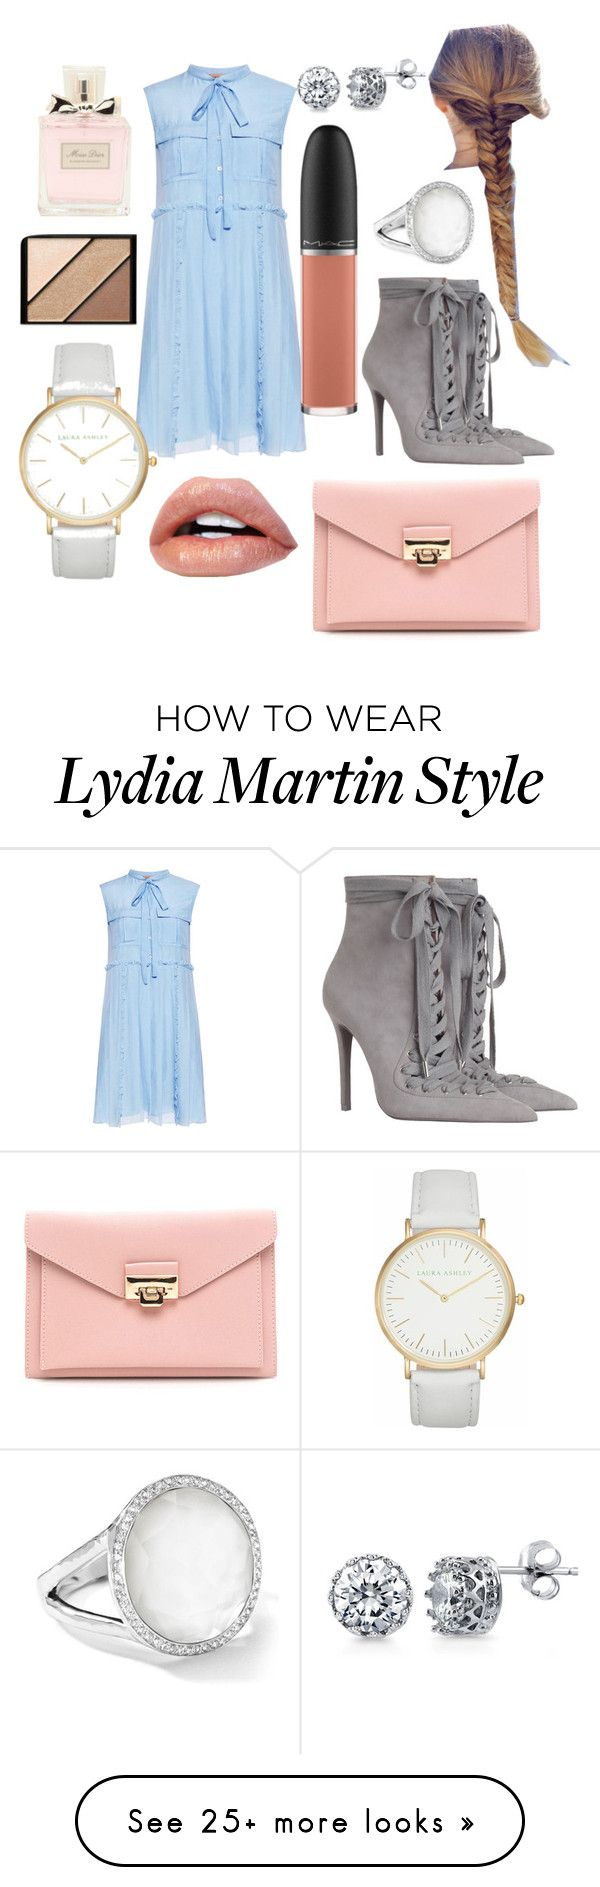 """Lydia Martin 3x11"" by lydiastilinski24 on Polyvore featuring N°21, Zimmermann, MAC Cosmetics, BERRICLE, Ippolita, Laura Ashley, Elizabeth Arden and Christian Dior"